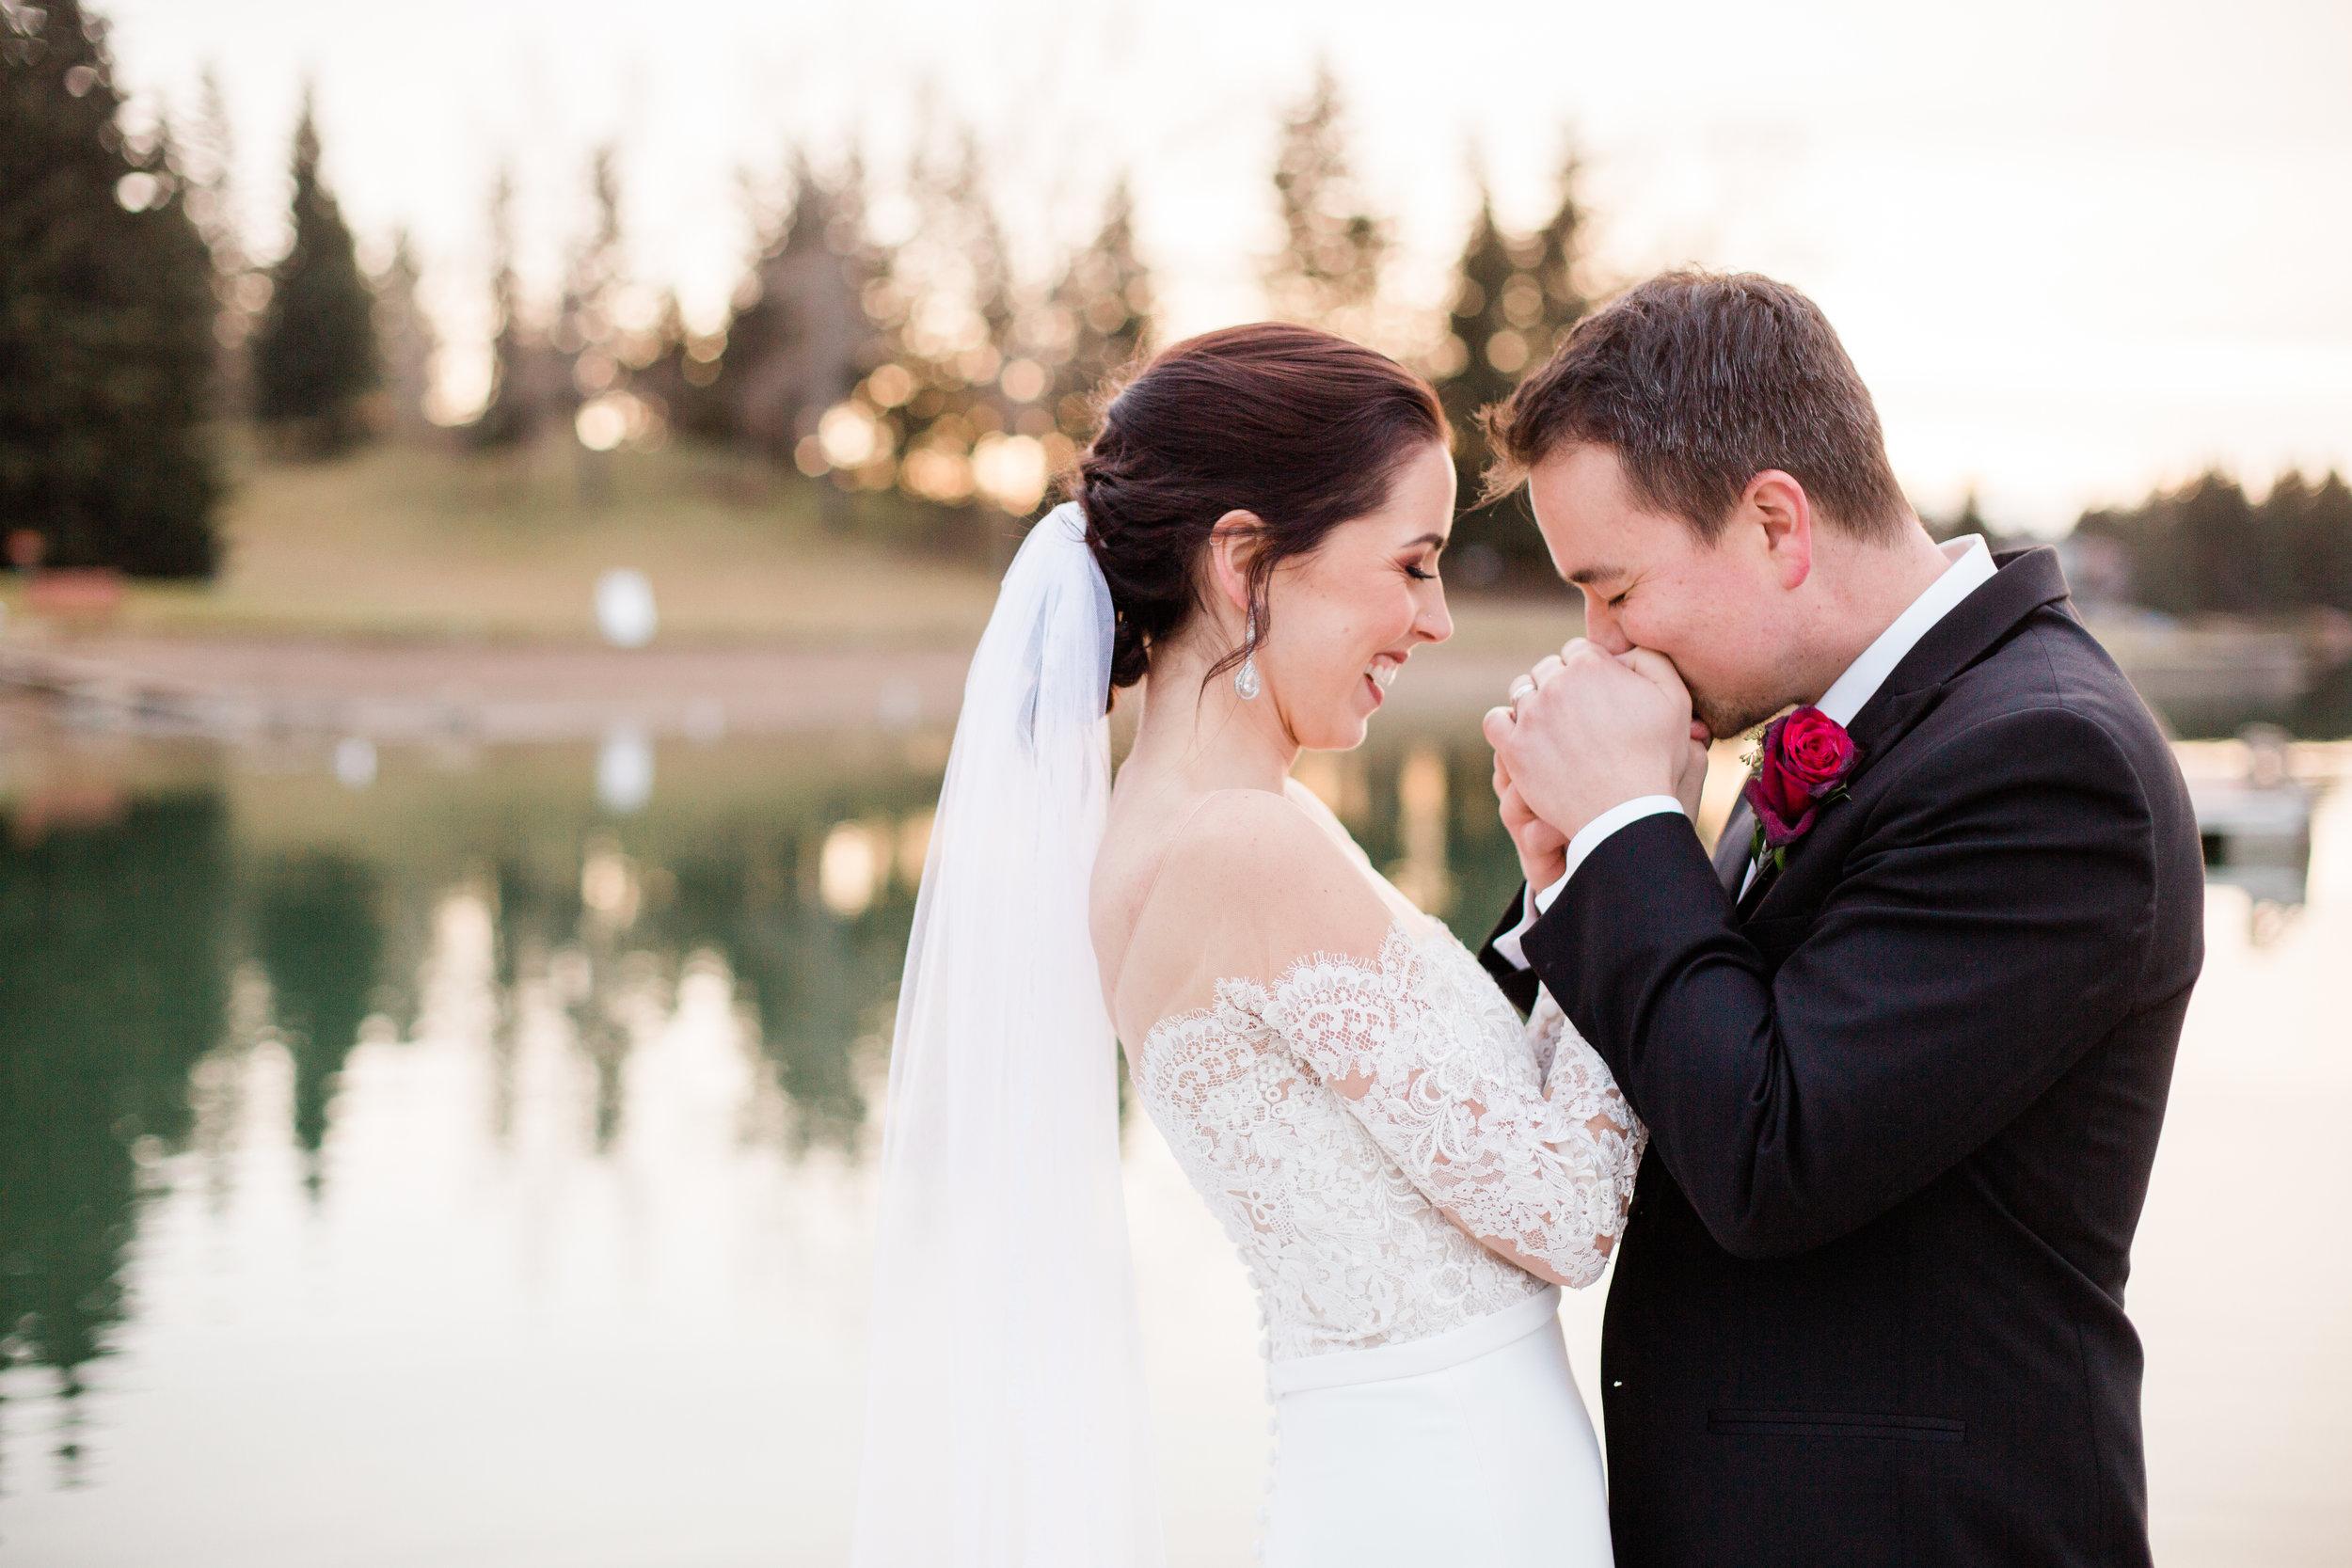 Kristina in Pronovias || Lindsayparkin.ca || The Lakehouse